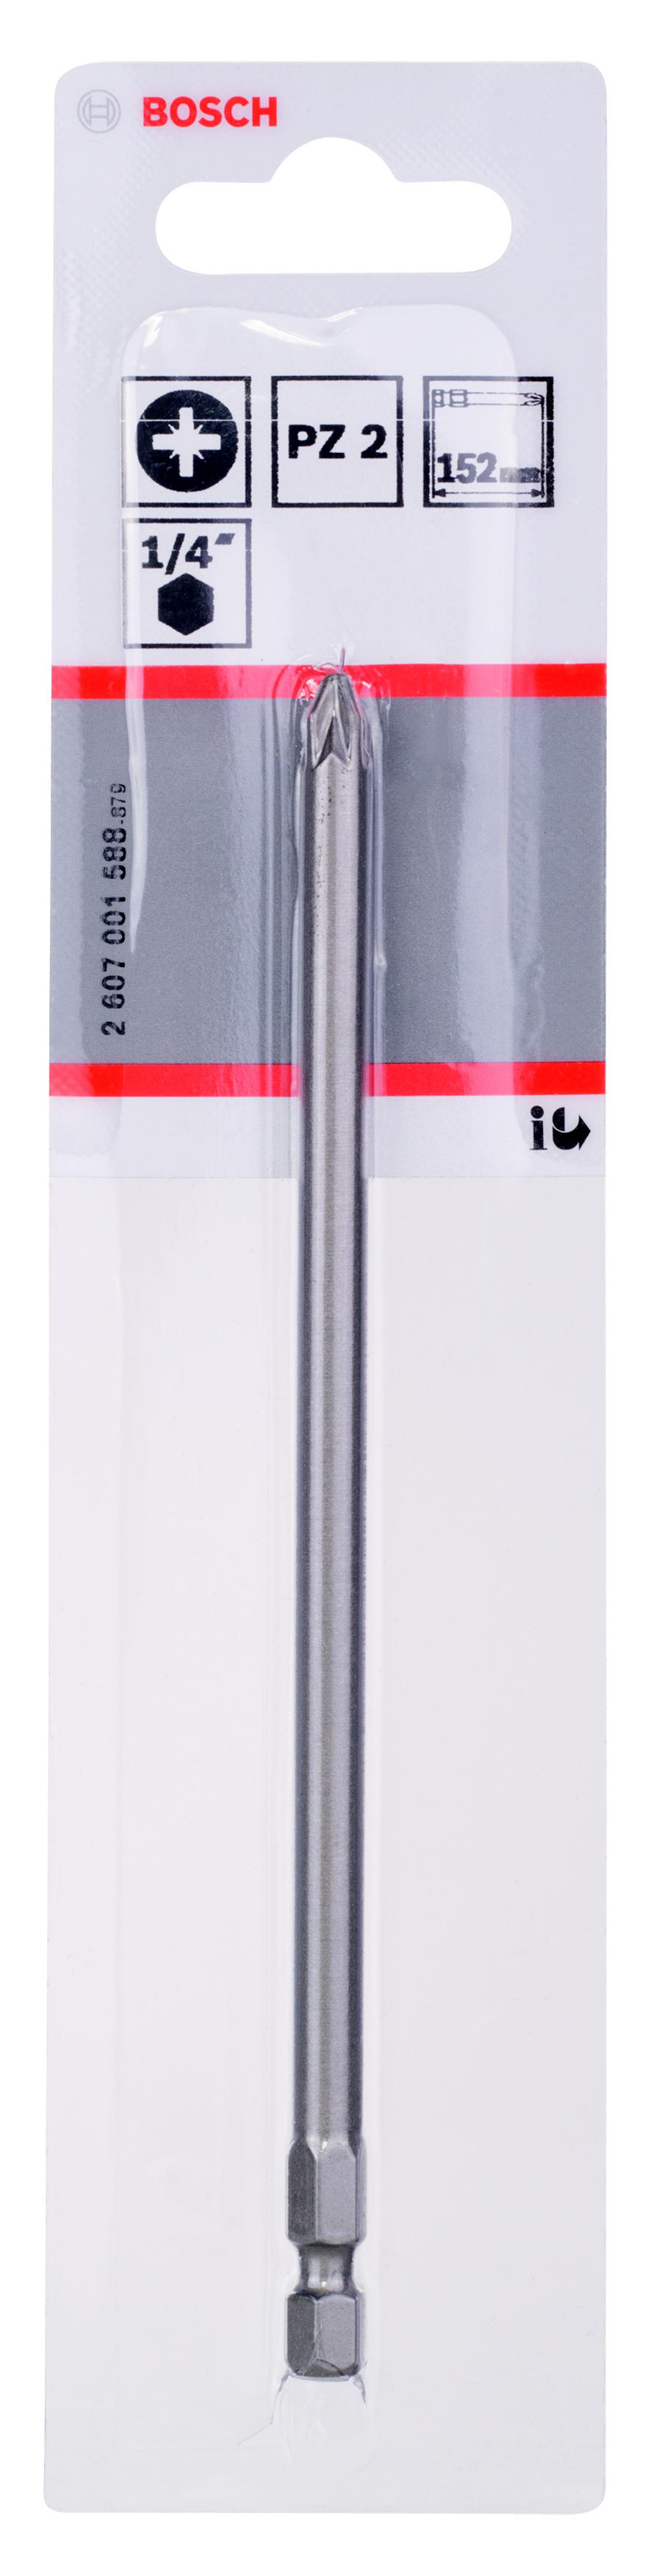 Extra-hart pz2 152 мм, 1 шт., Бита